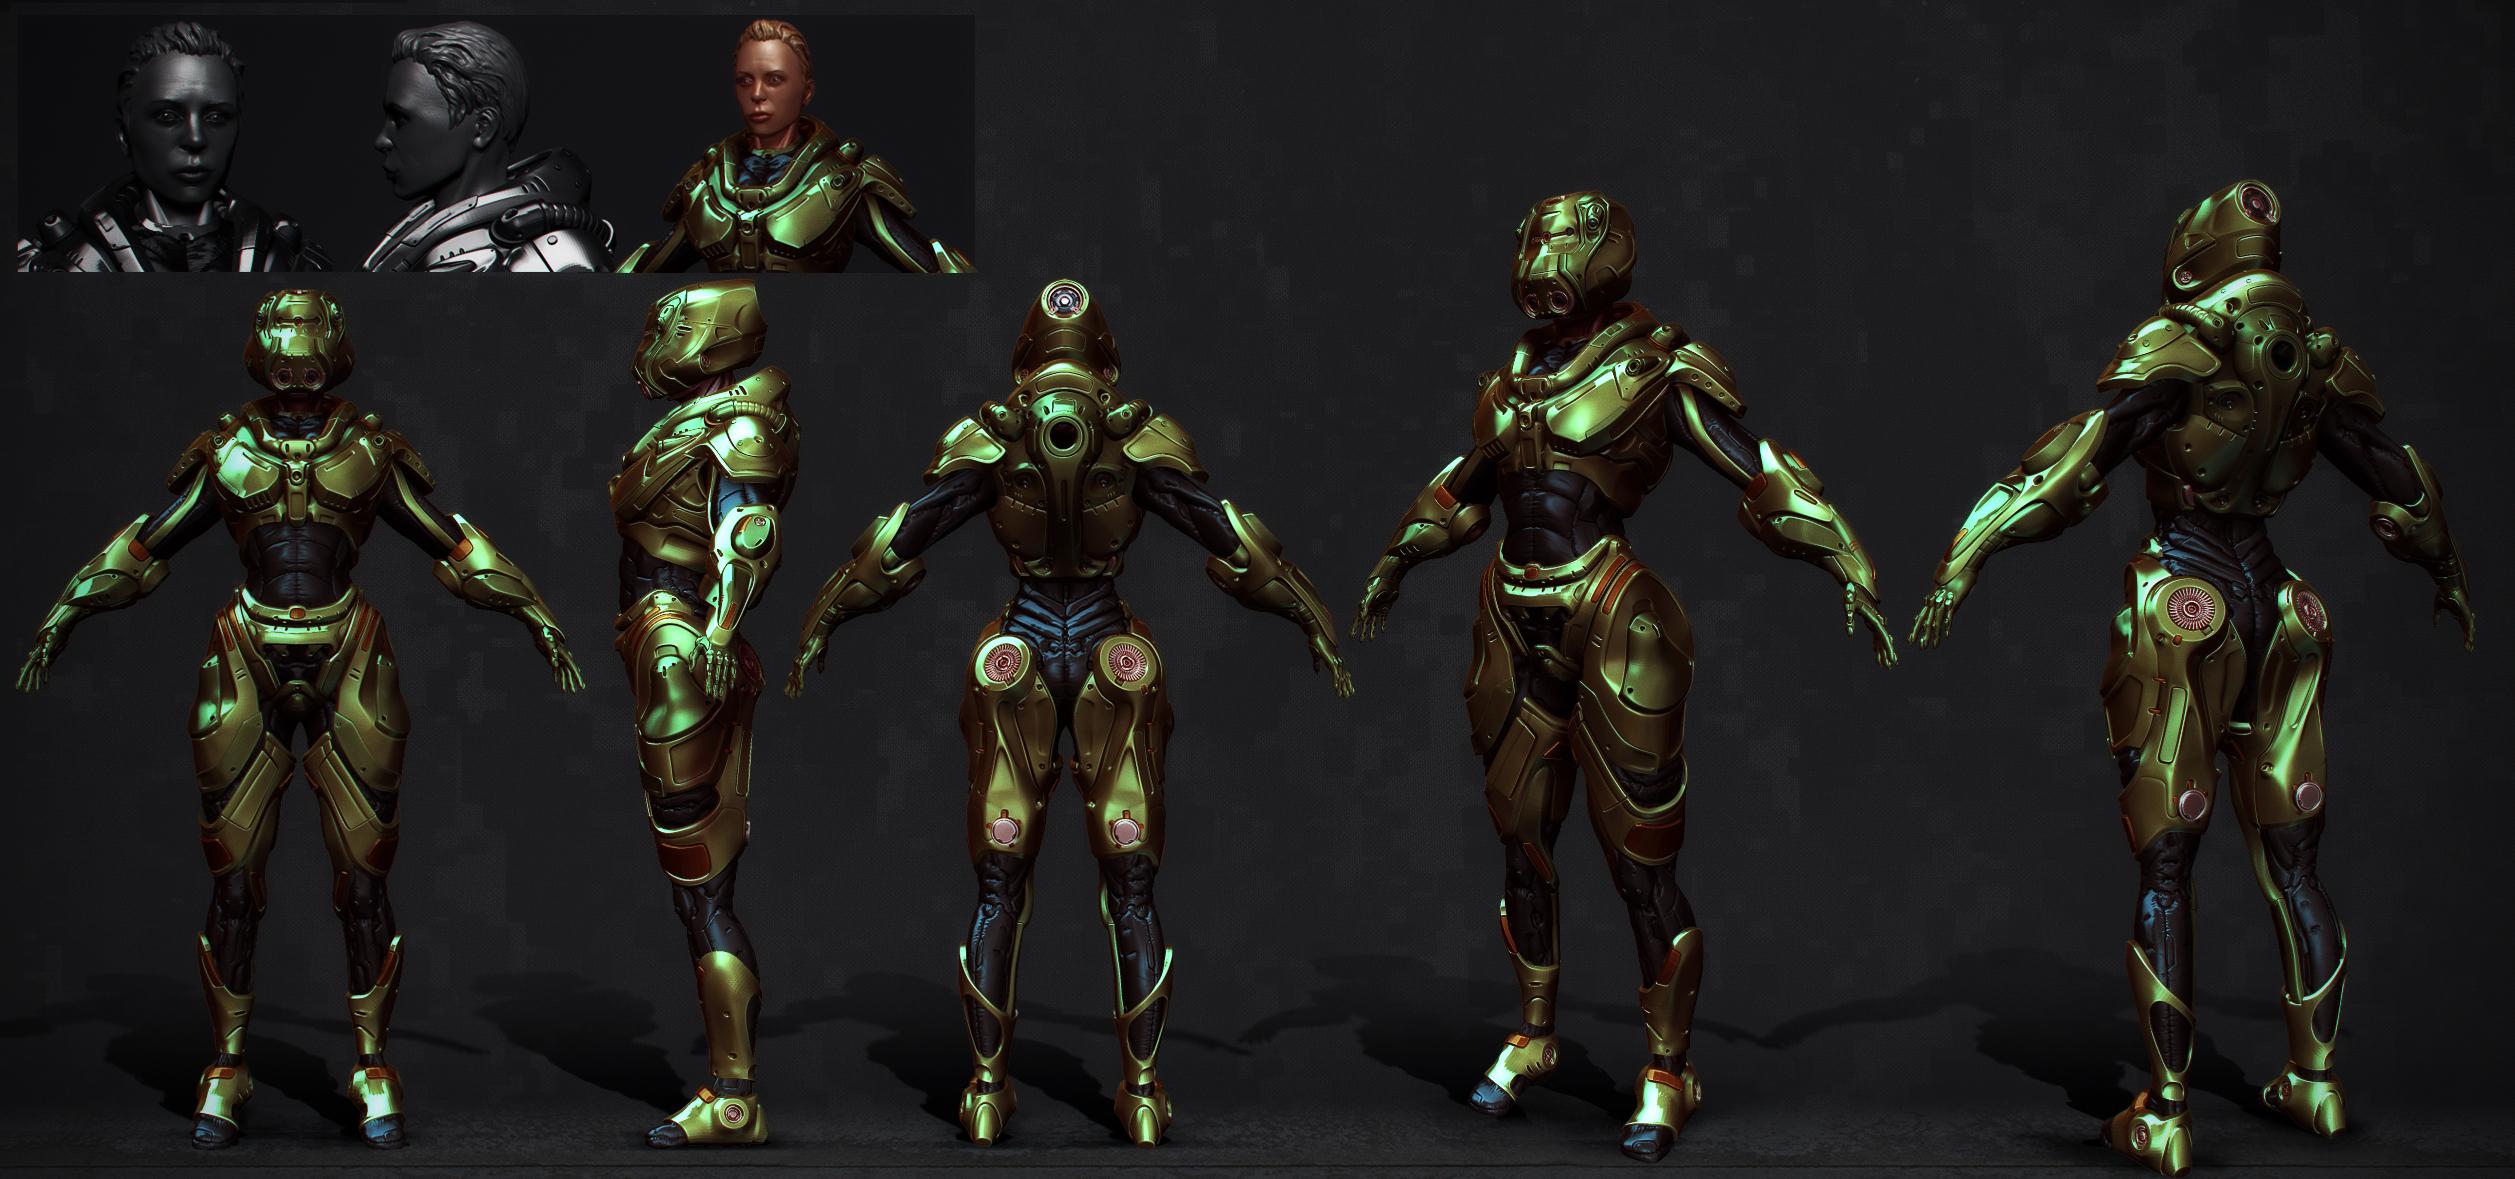 armored girl by Crashmgn